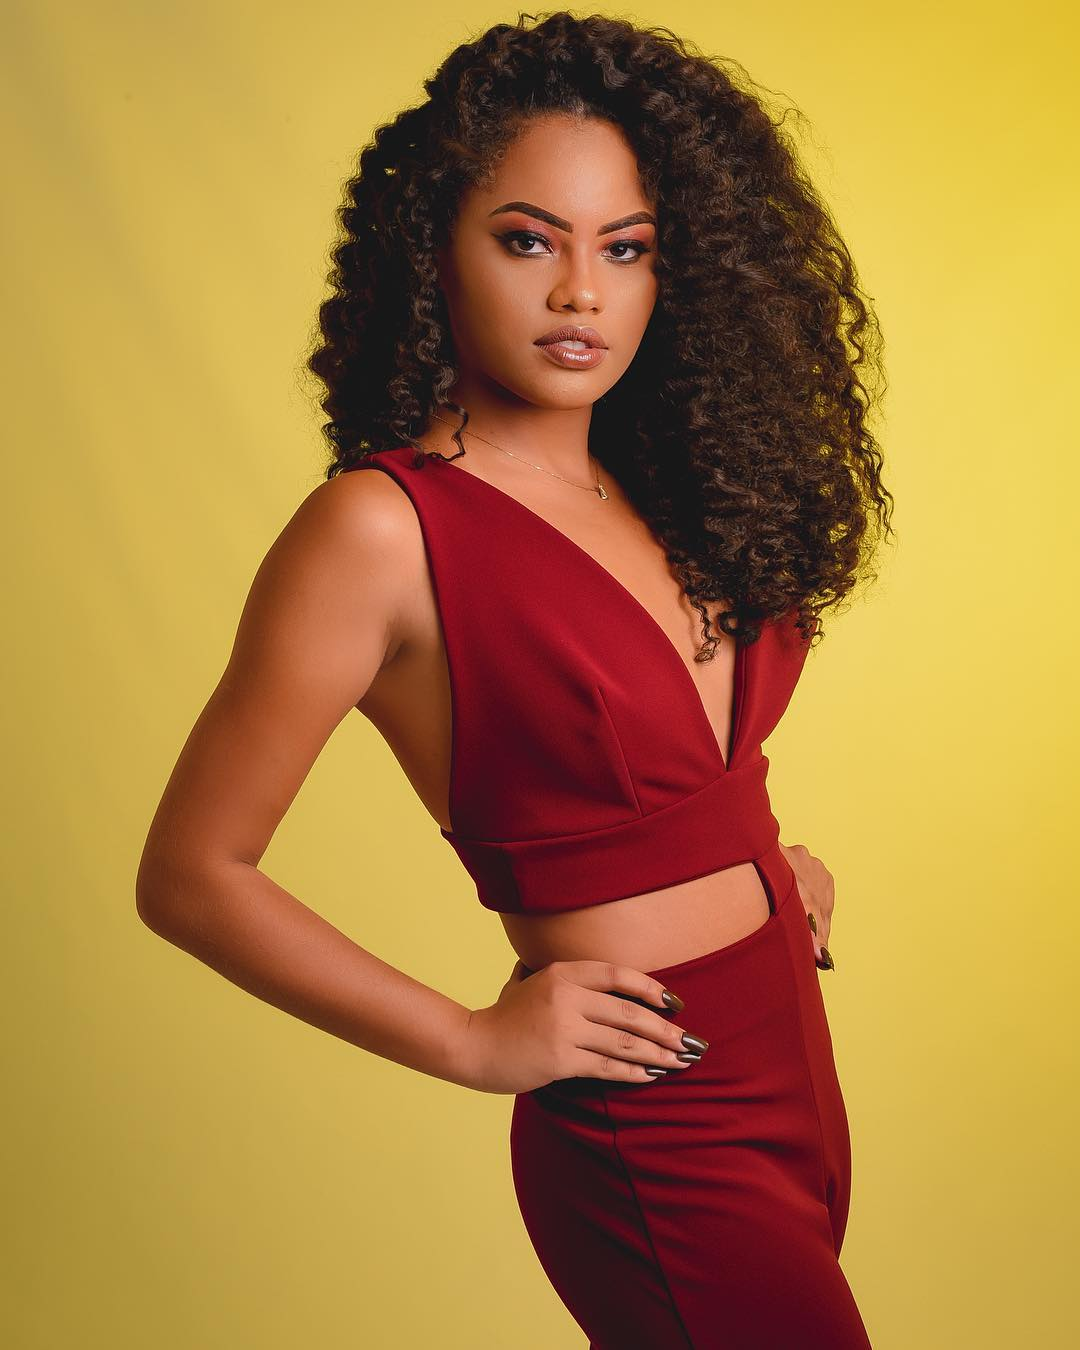 candidatas a miss brasil universo 2019. final: 09 de marso. - Página 2 Zkypgxuu